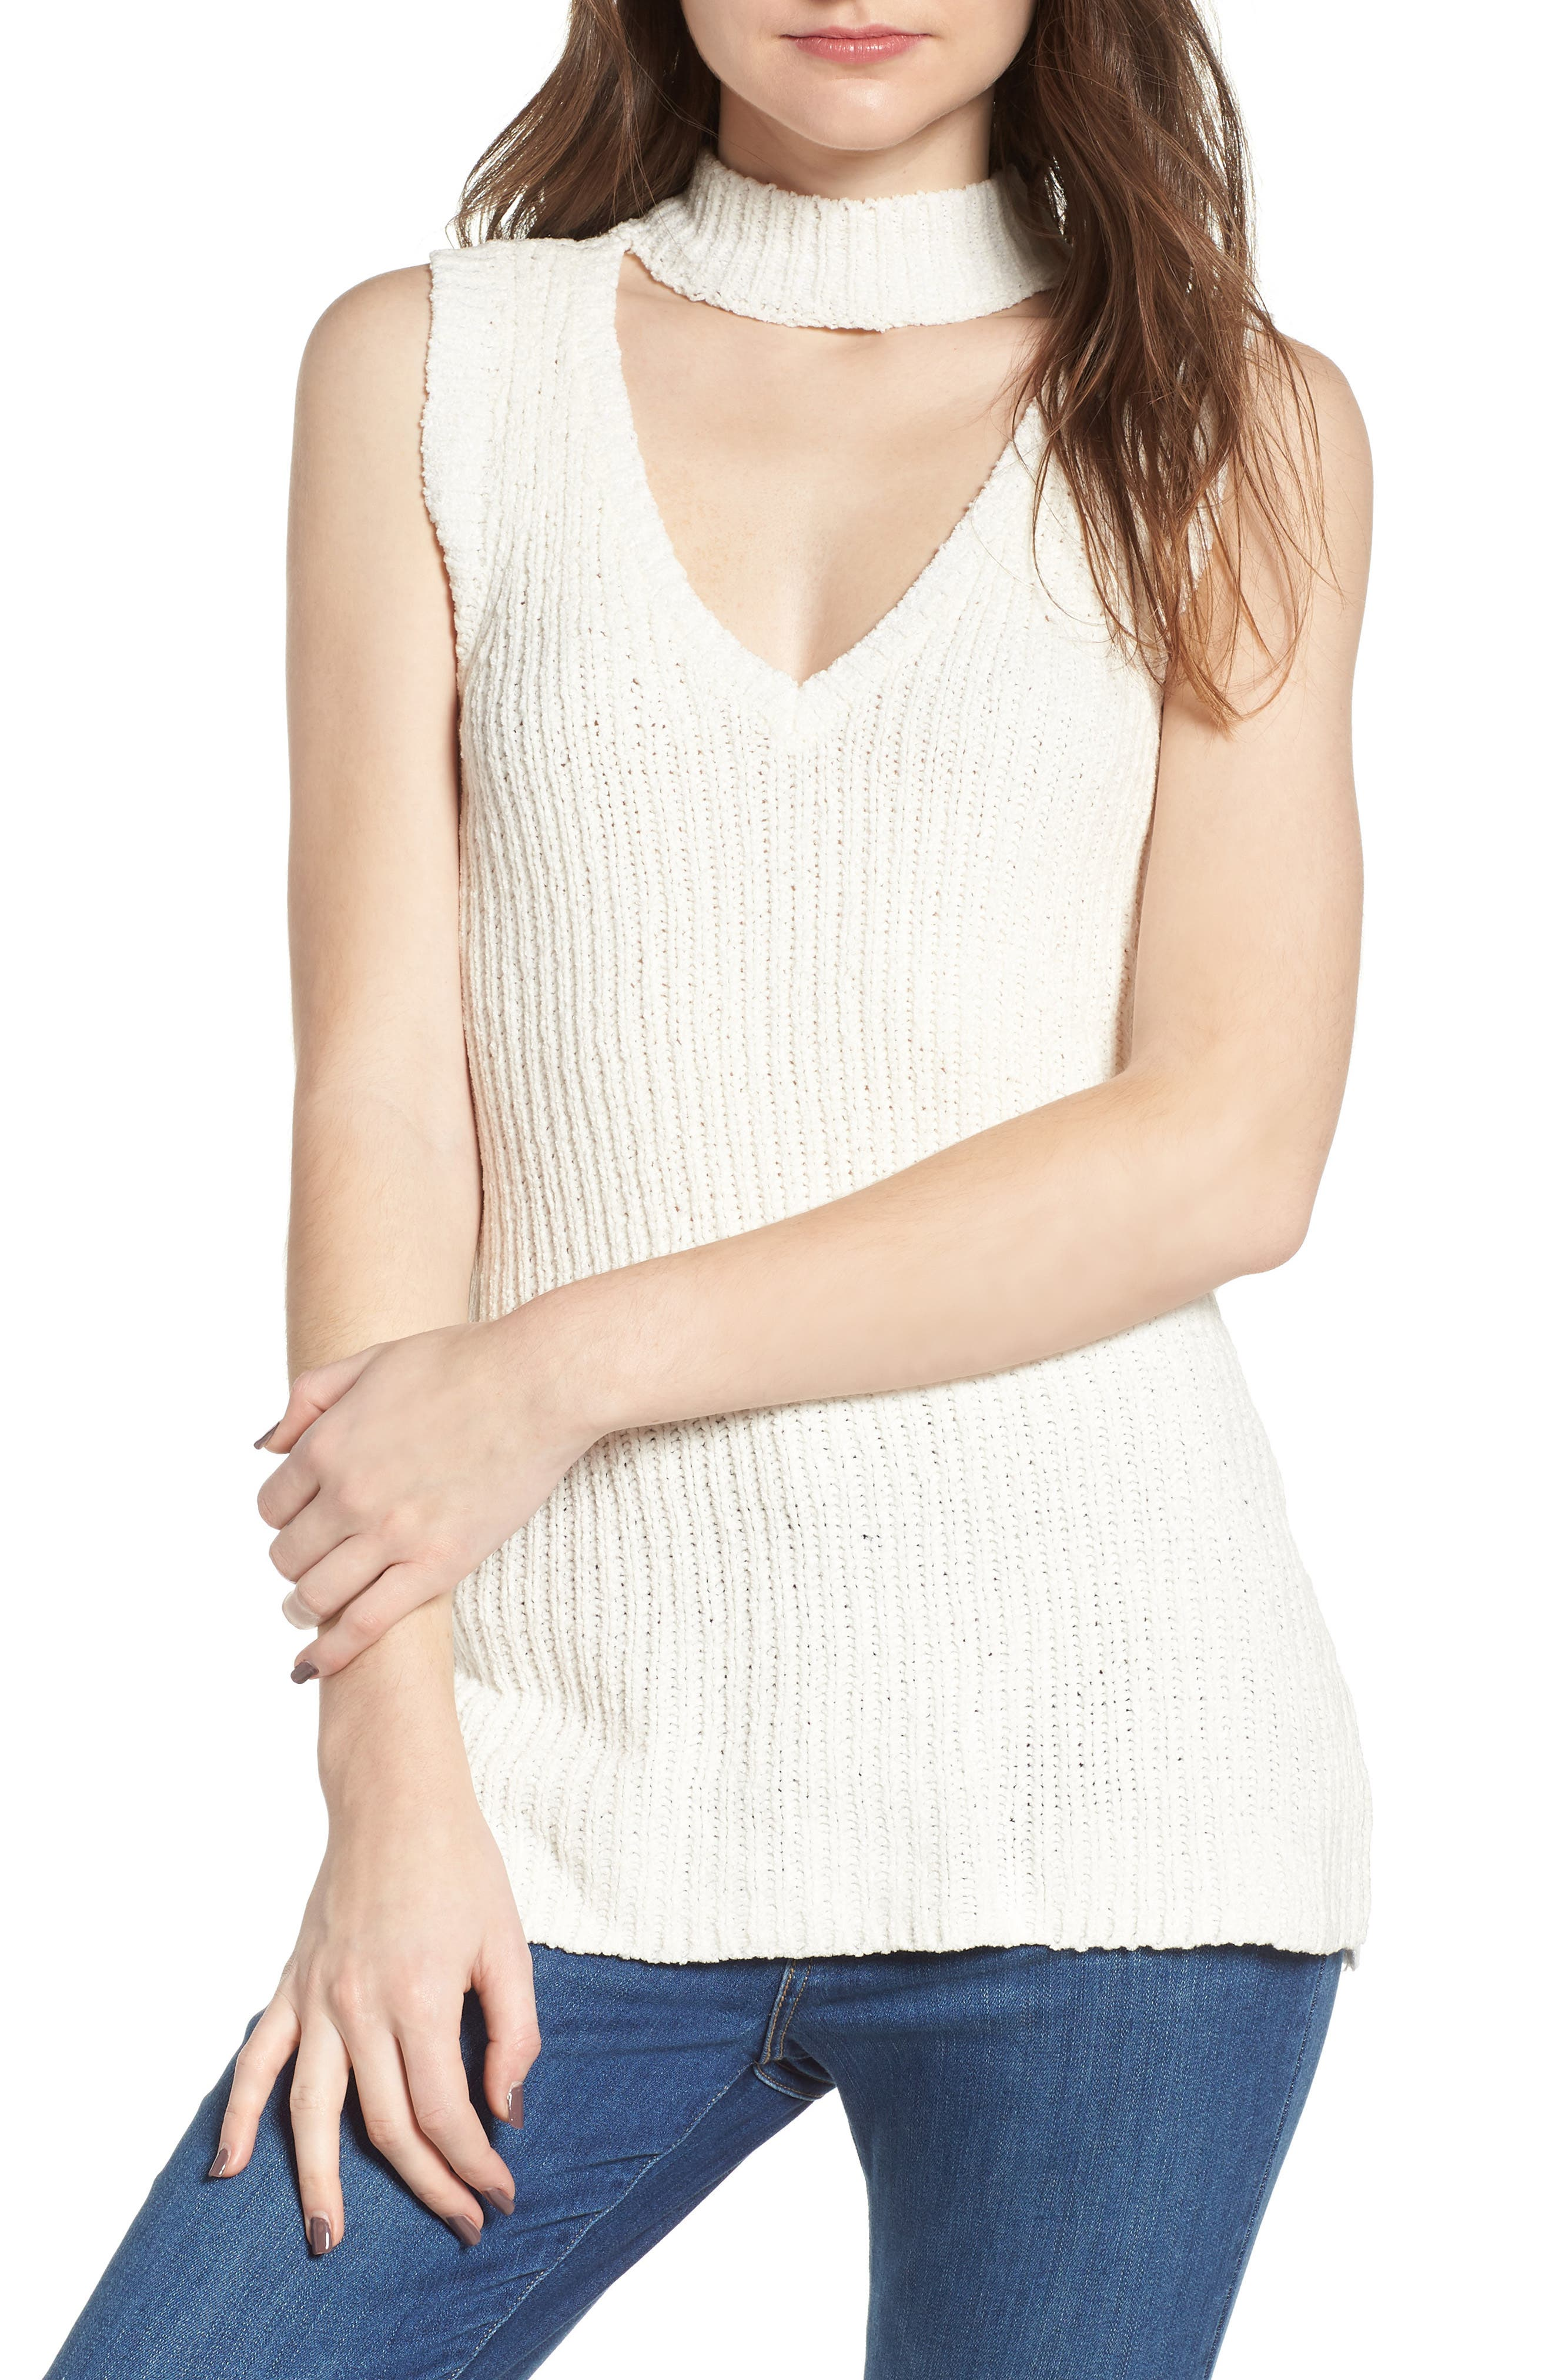 Camdon Sleeveless Sweater,                             Main thumbnail 1, color,                             Ivory